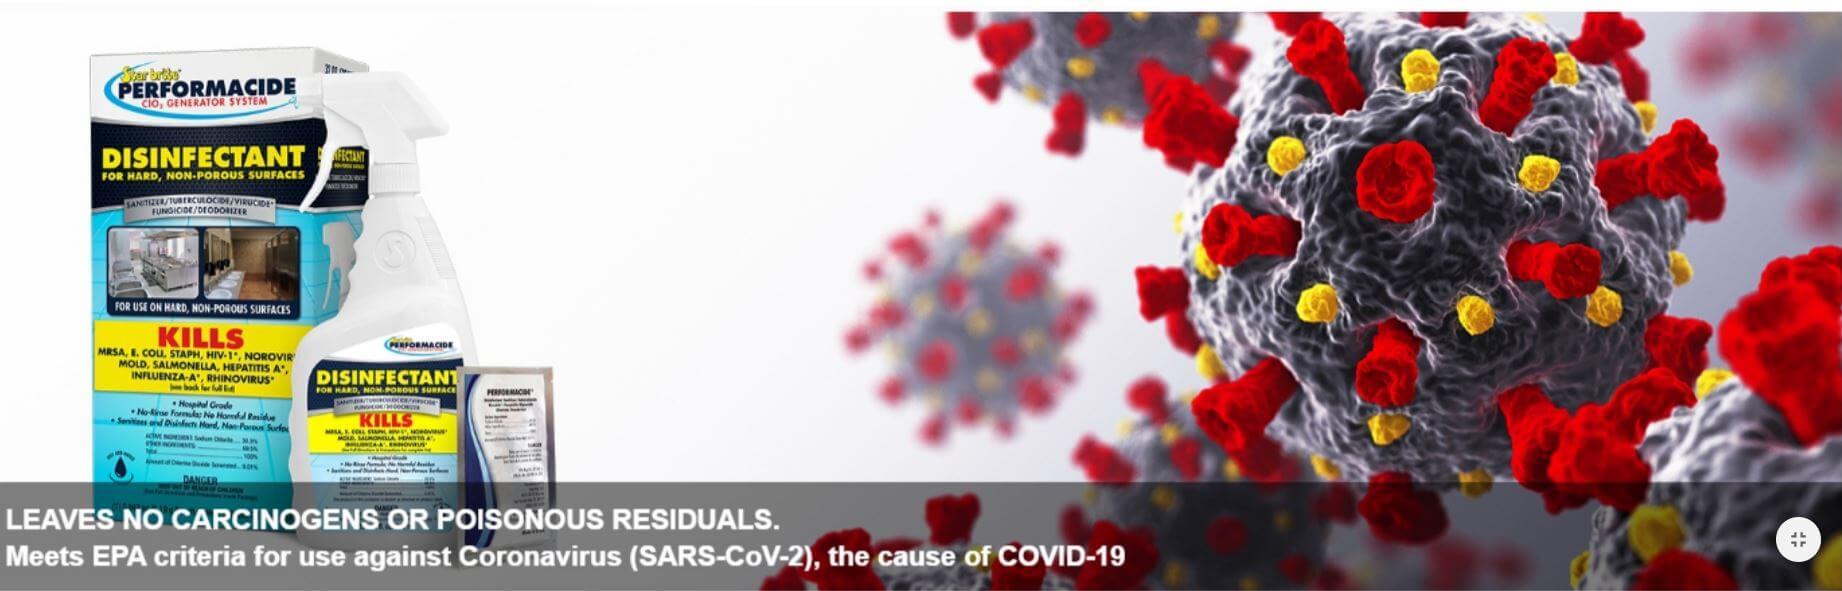 Performacide - Coronavirus (COVID-19)